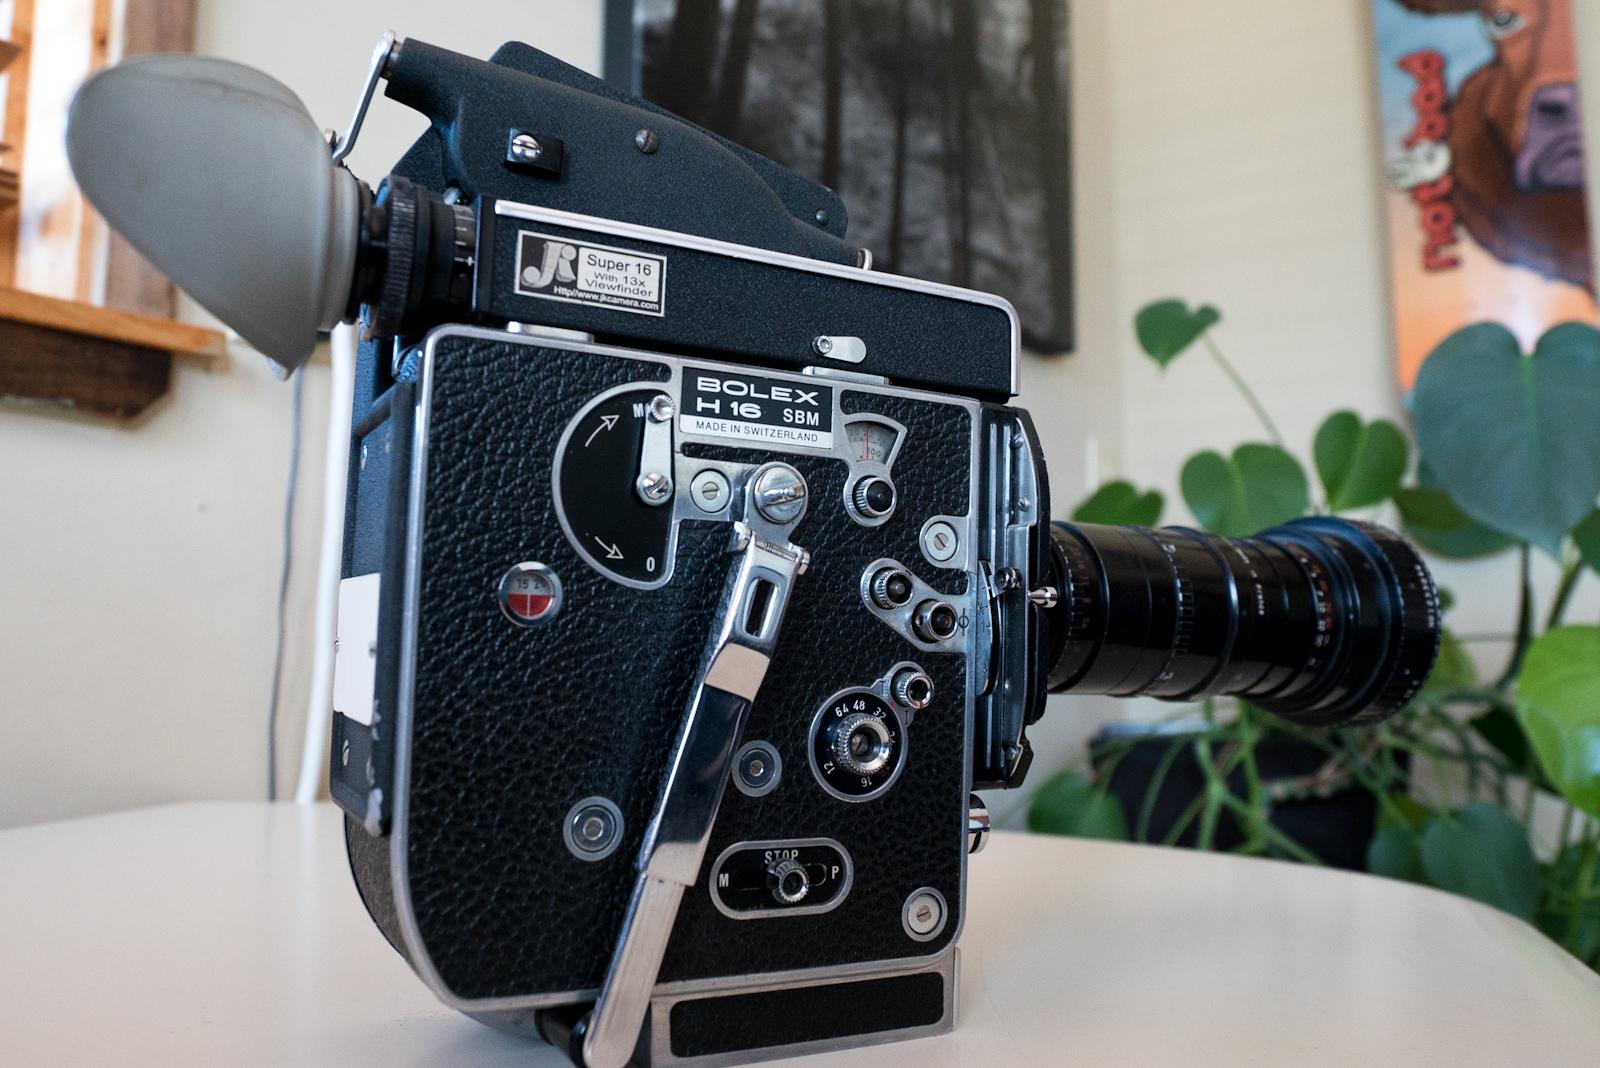 Bolex film camera